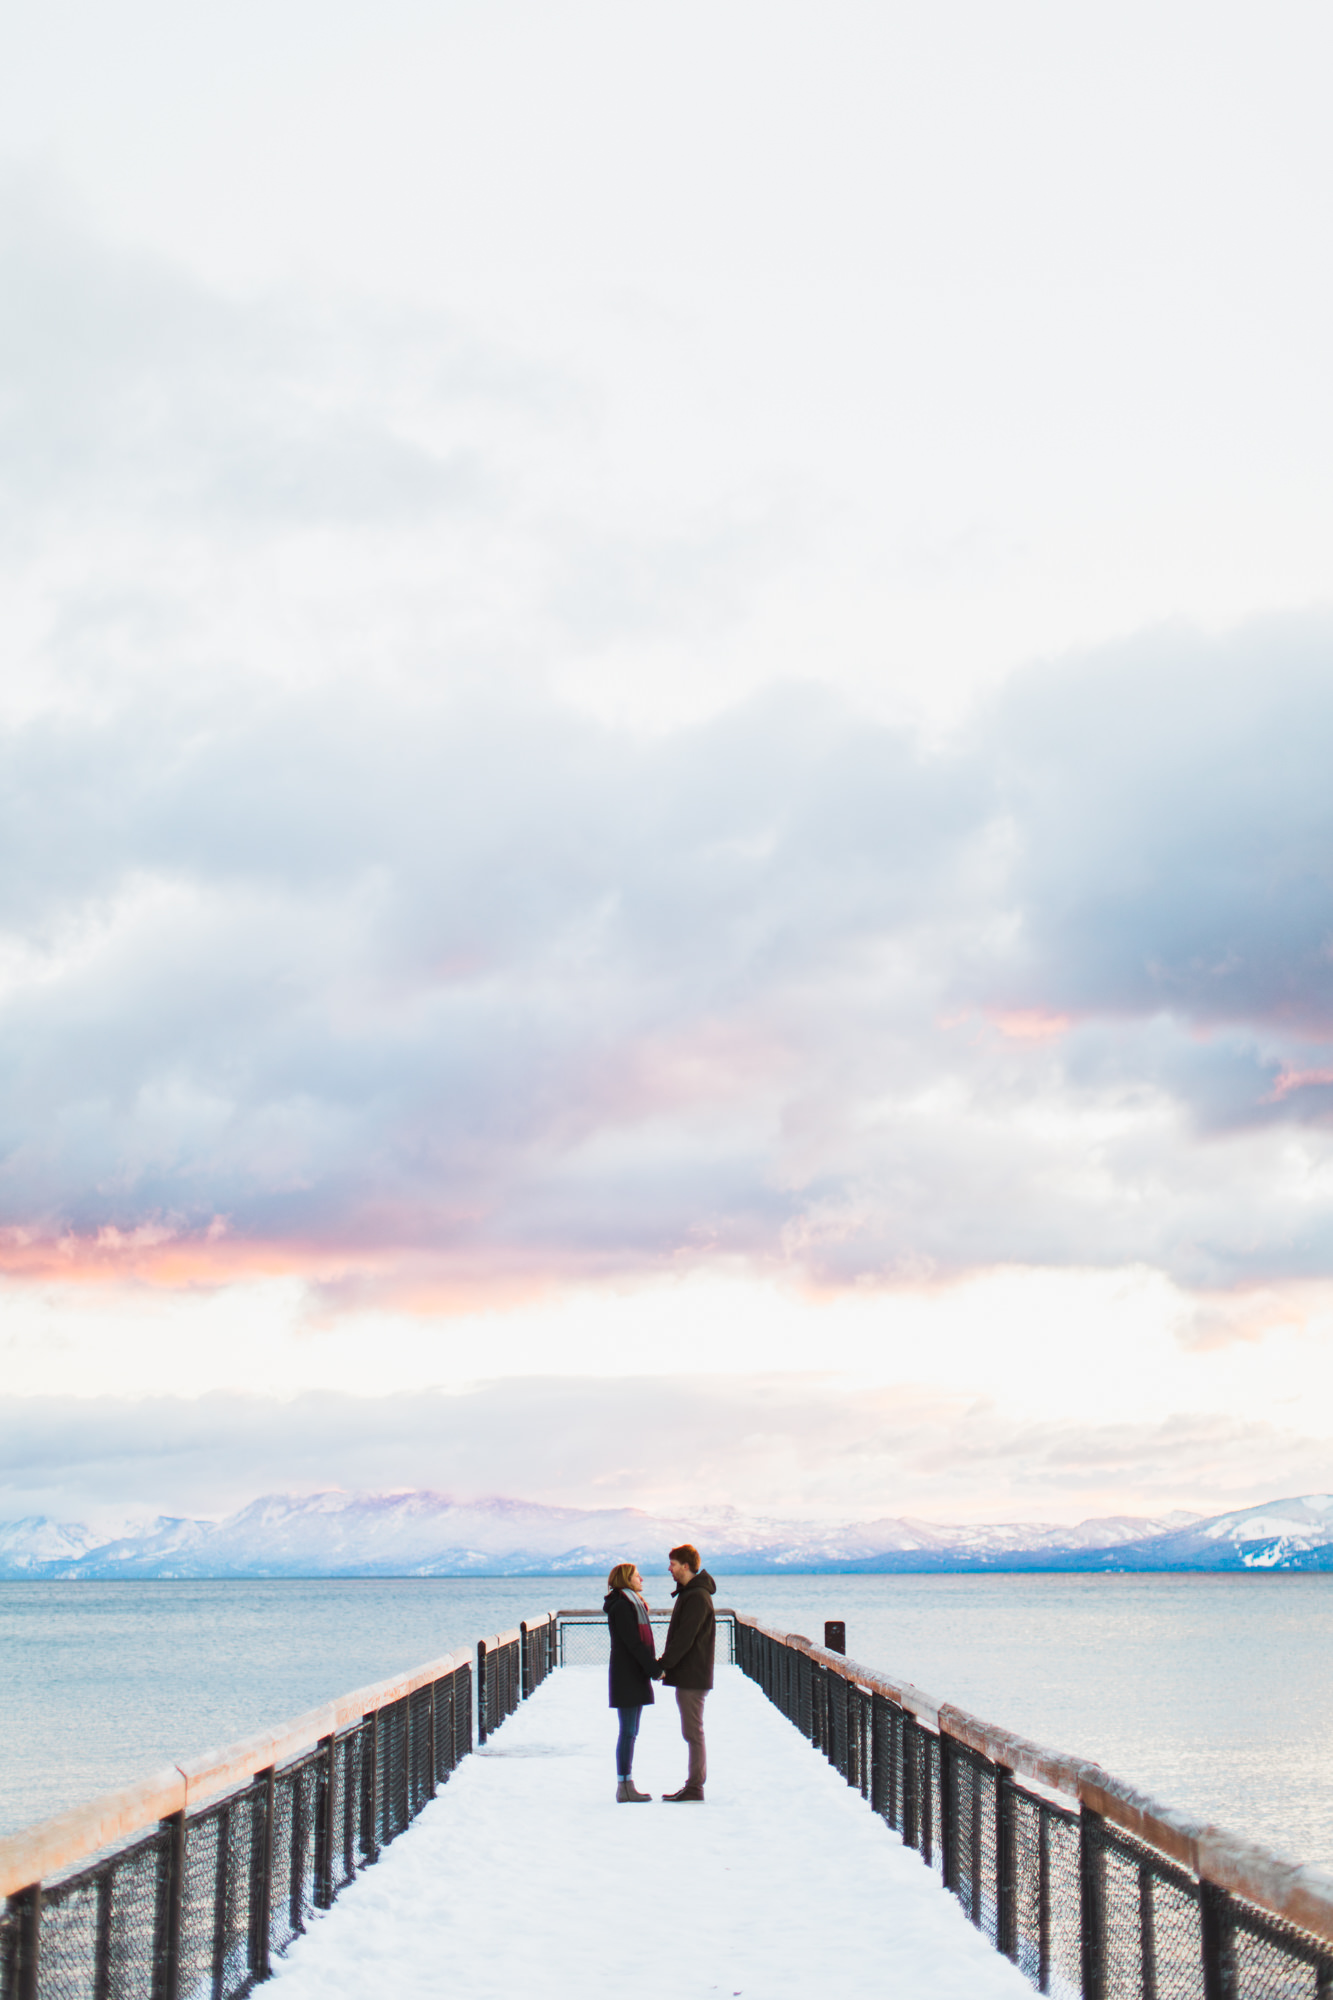 snowy engagement session on lake tahoe | destination engagement photo inspiration | utah adventure elopement photographers | the hearnes adventure photography | www.thehearnes.com